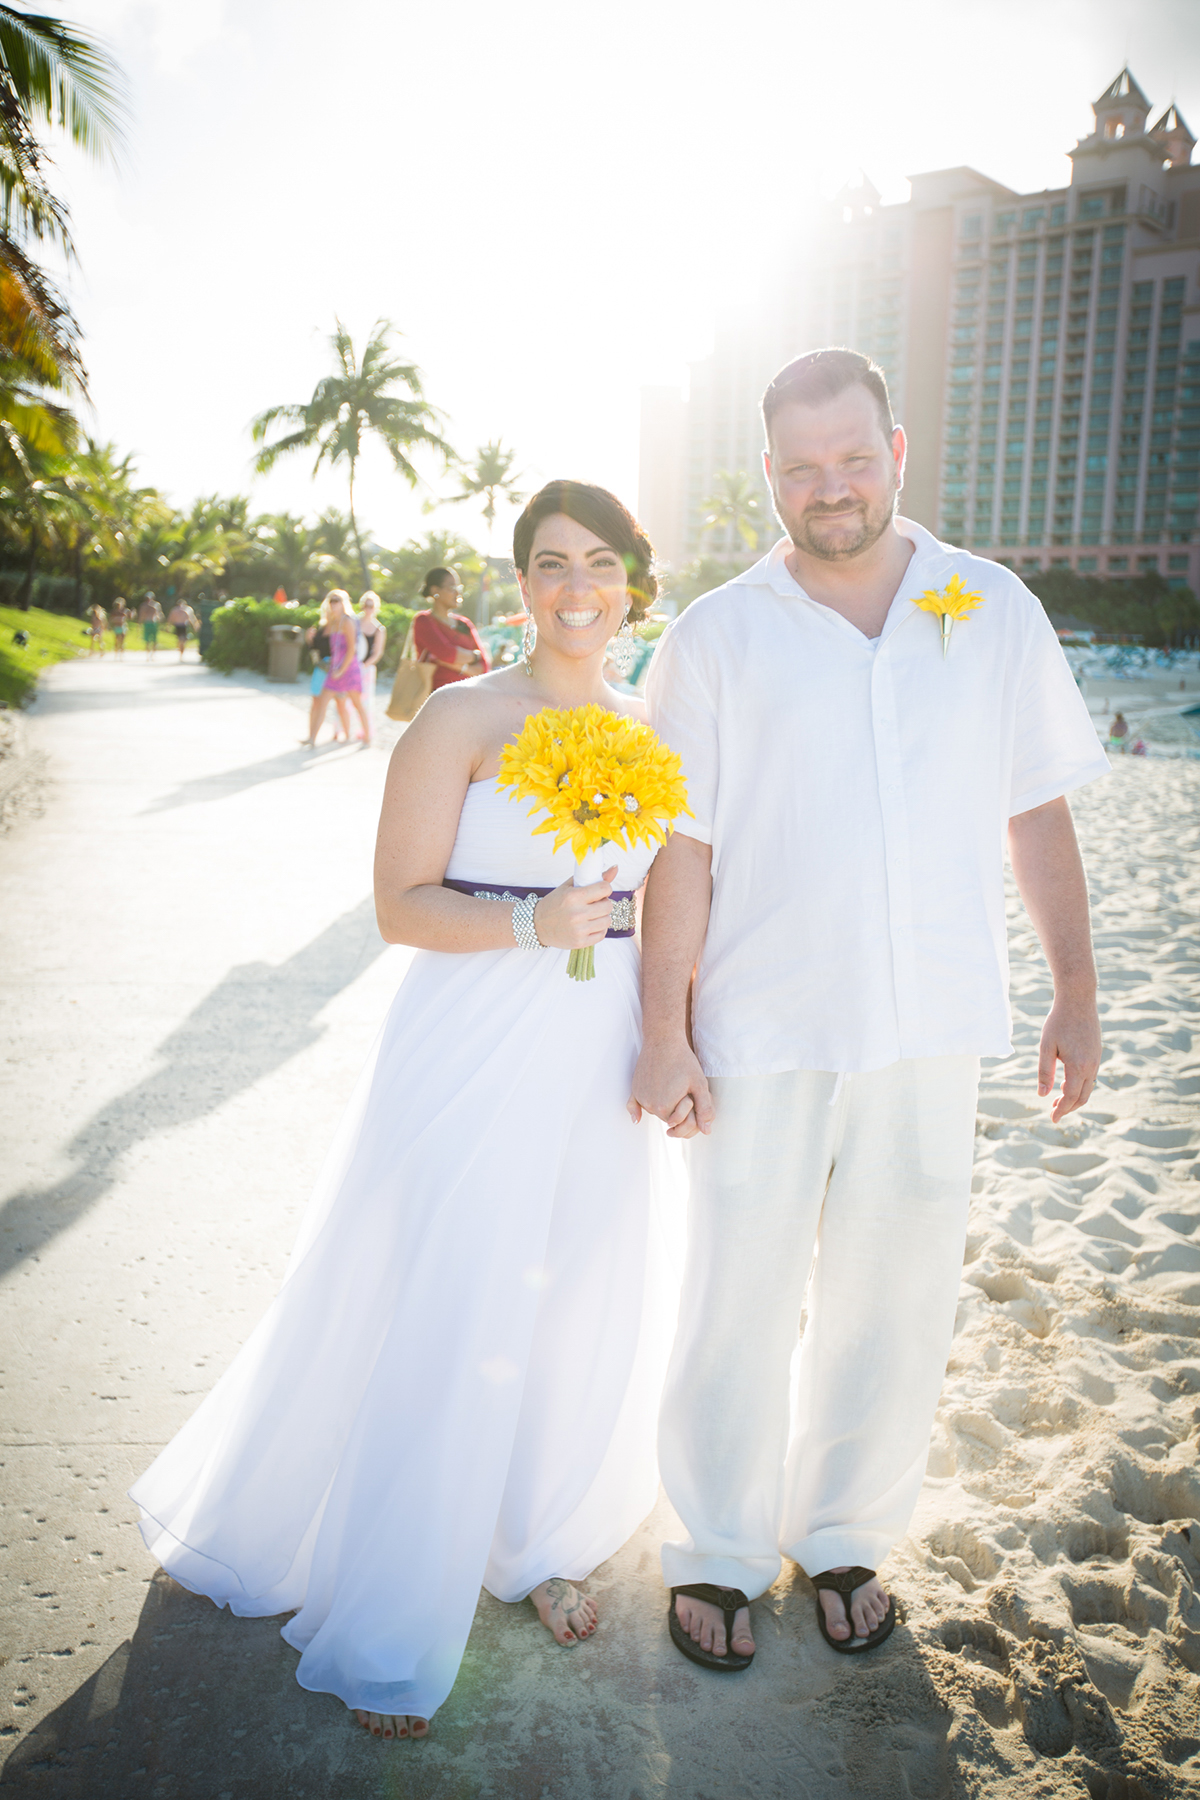 Daniela-Edvard_wedding_Dukat-Photos-1307.jpg